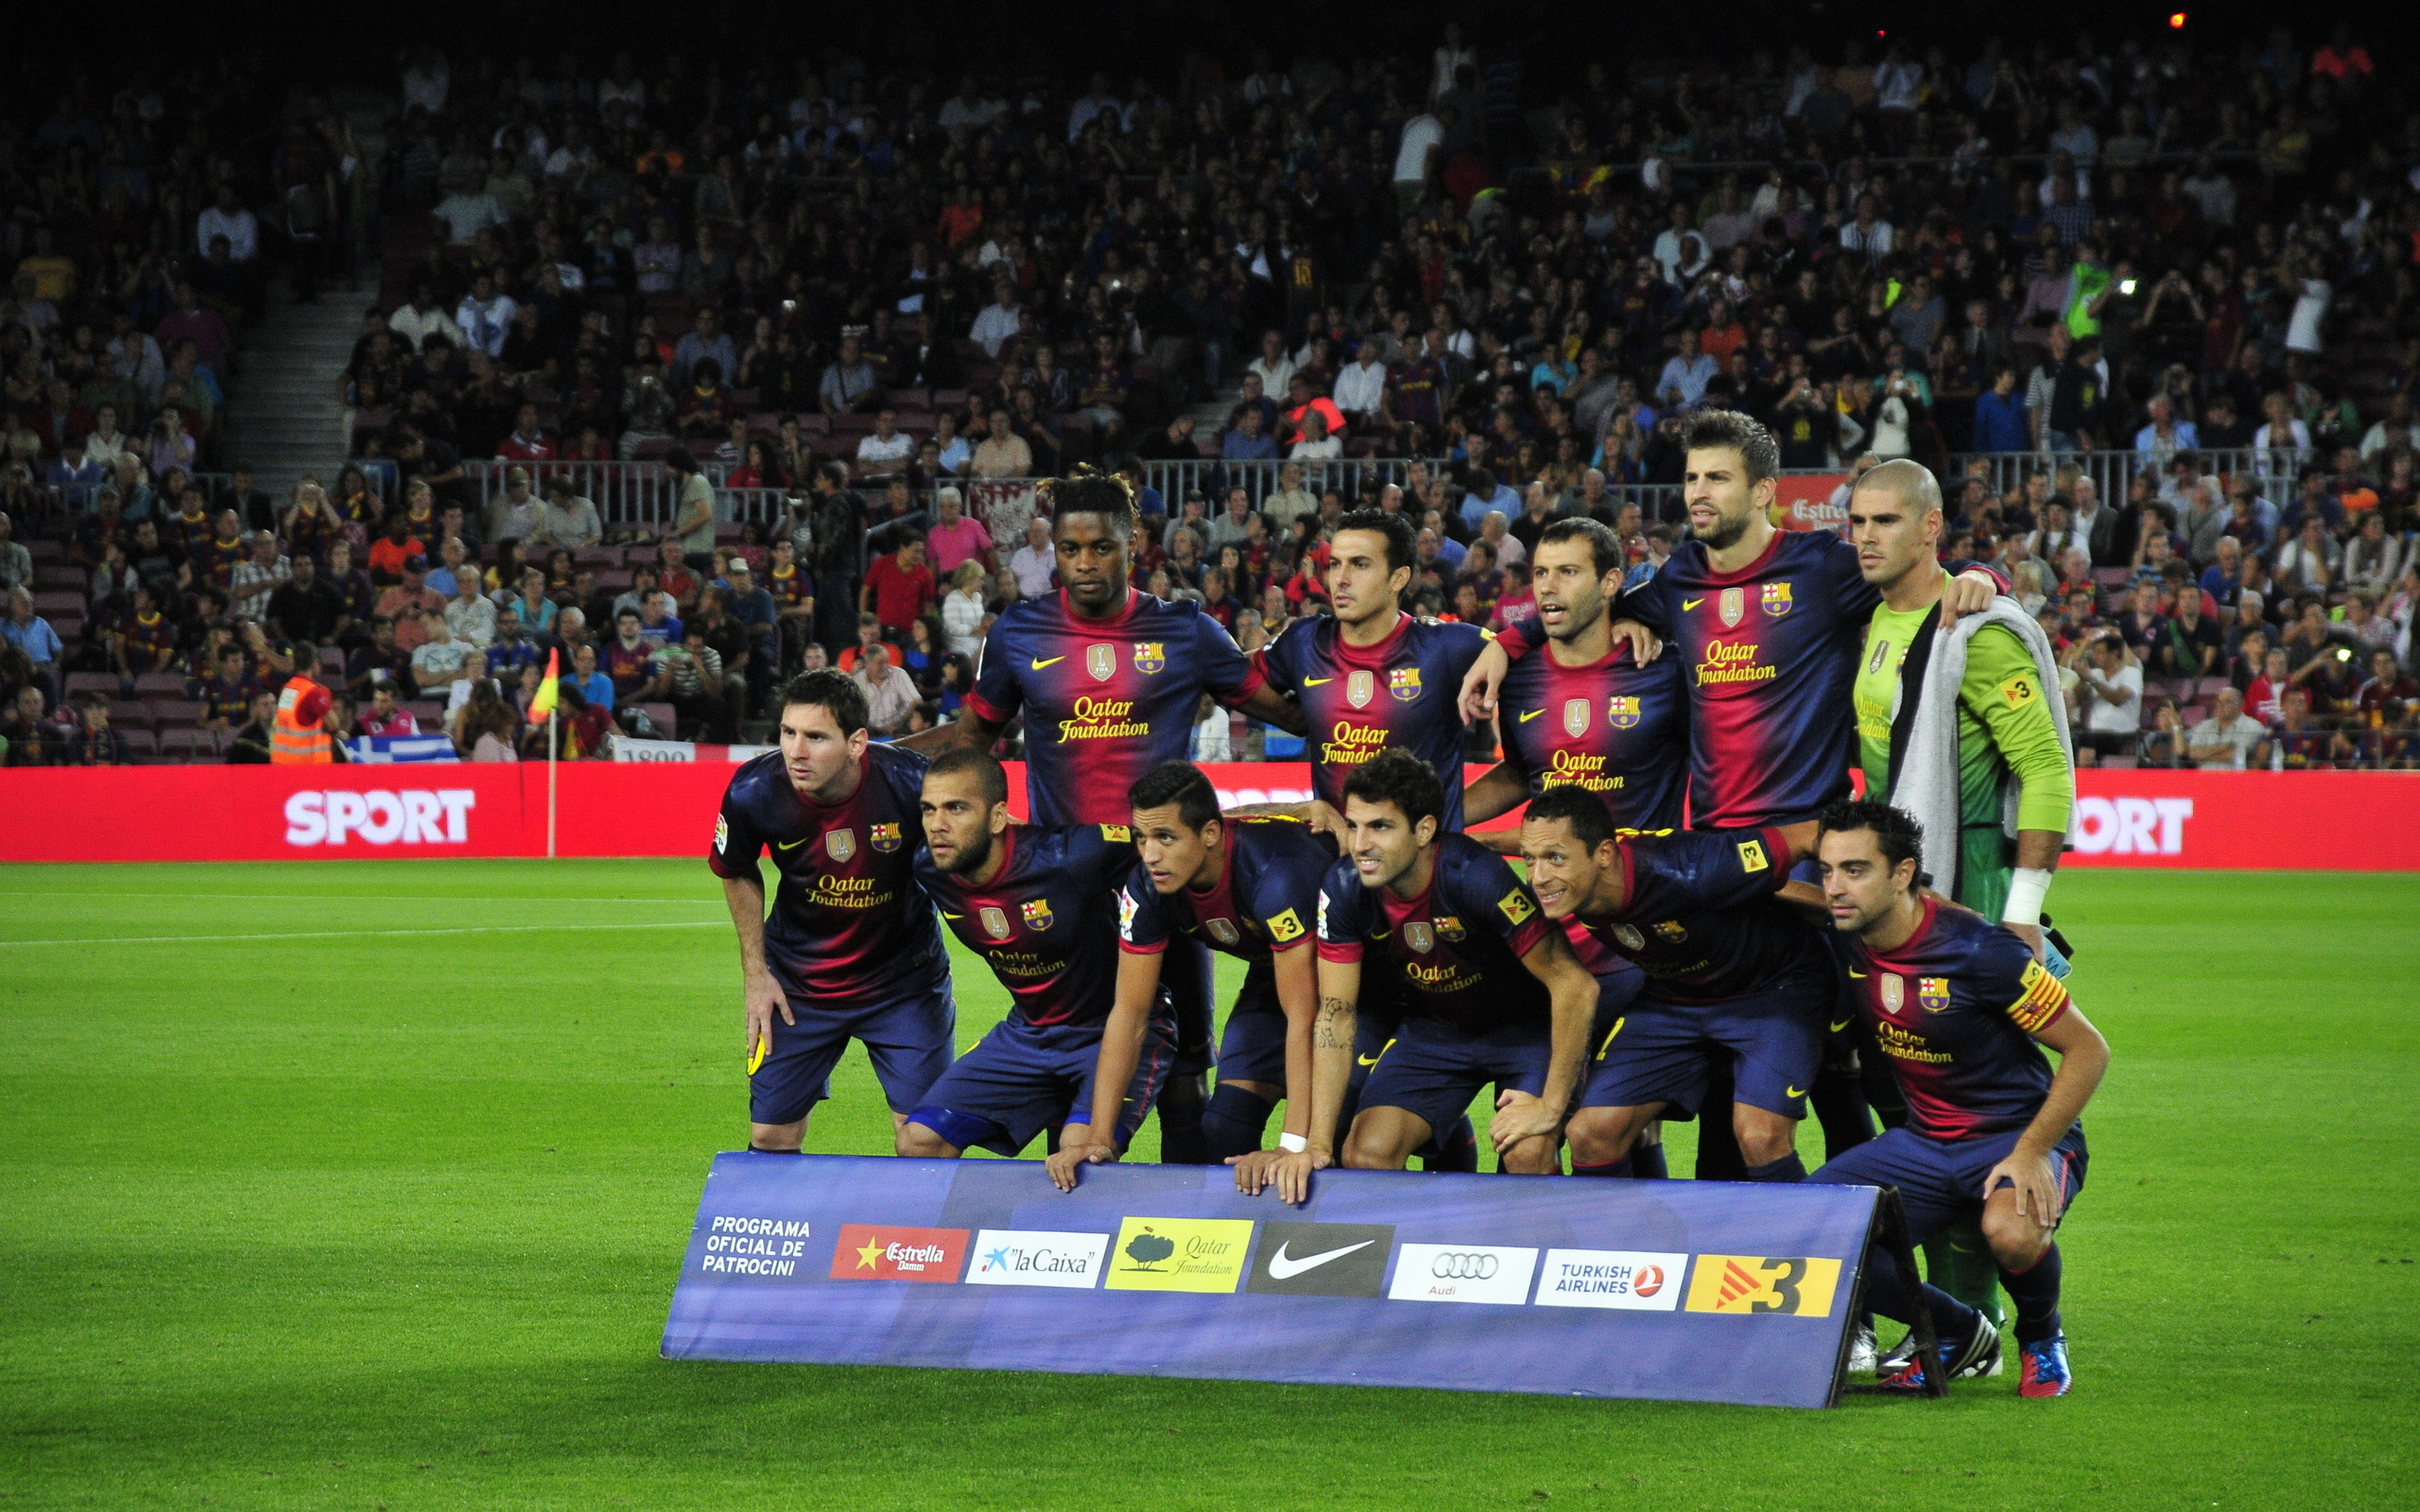 футбол, команда, фото